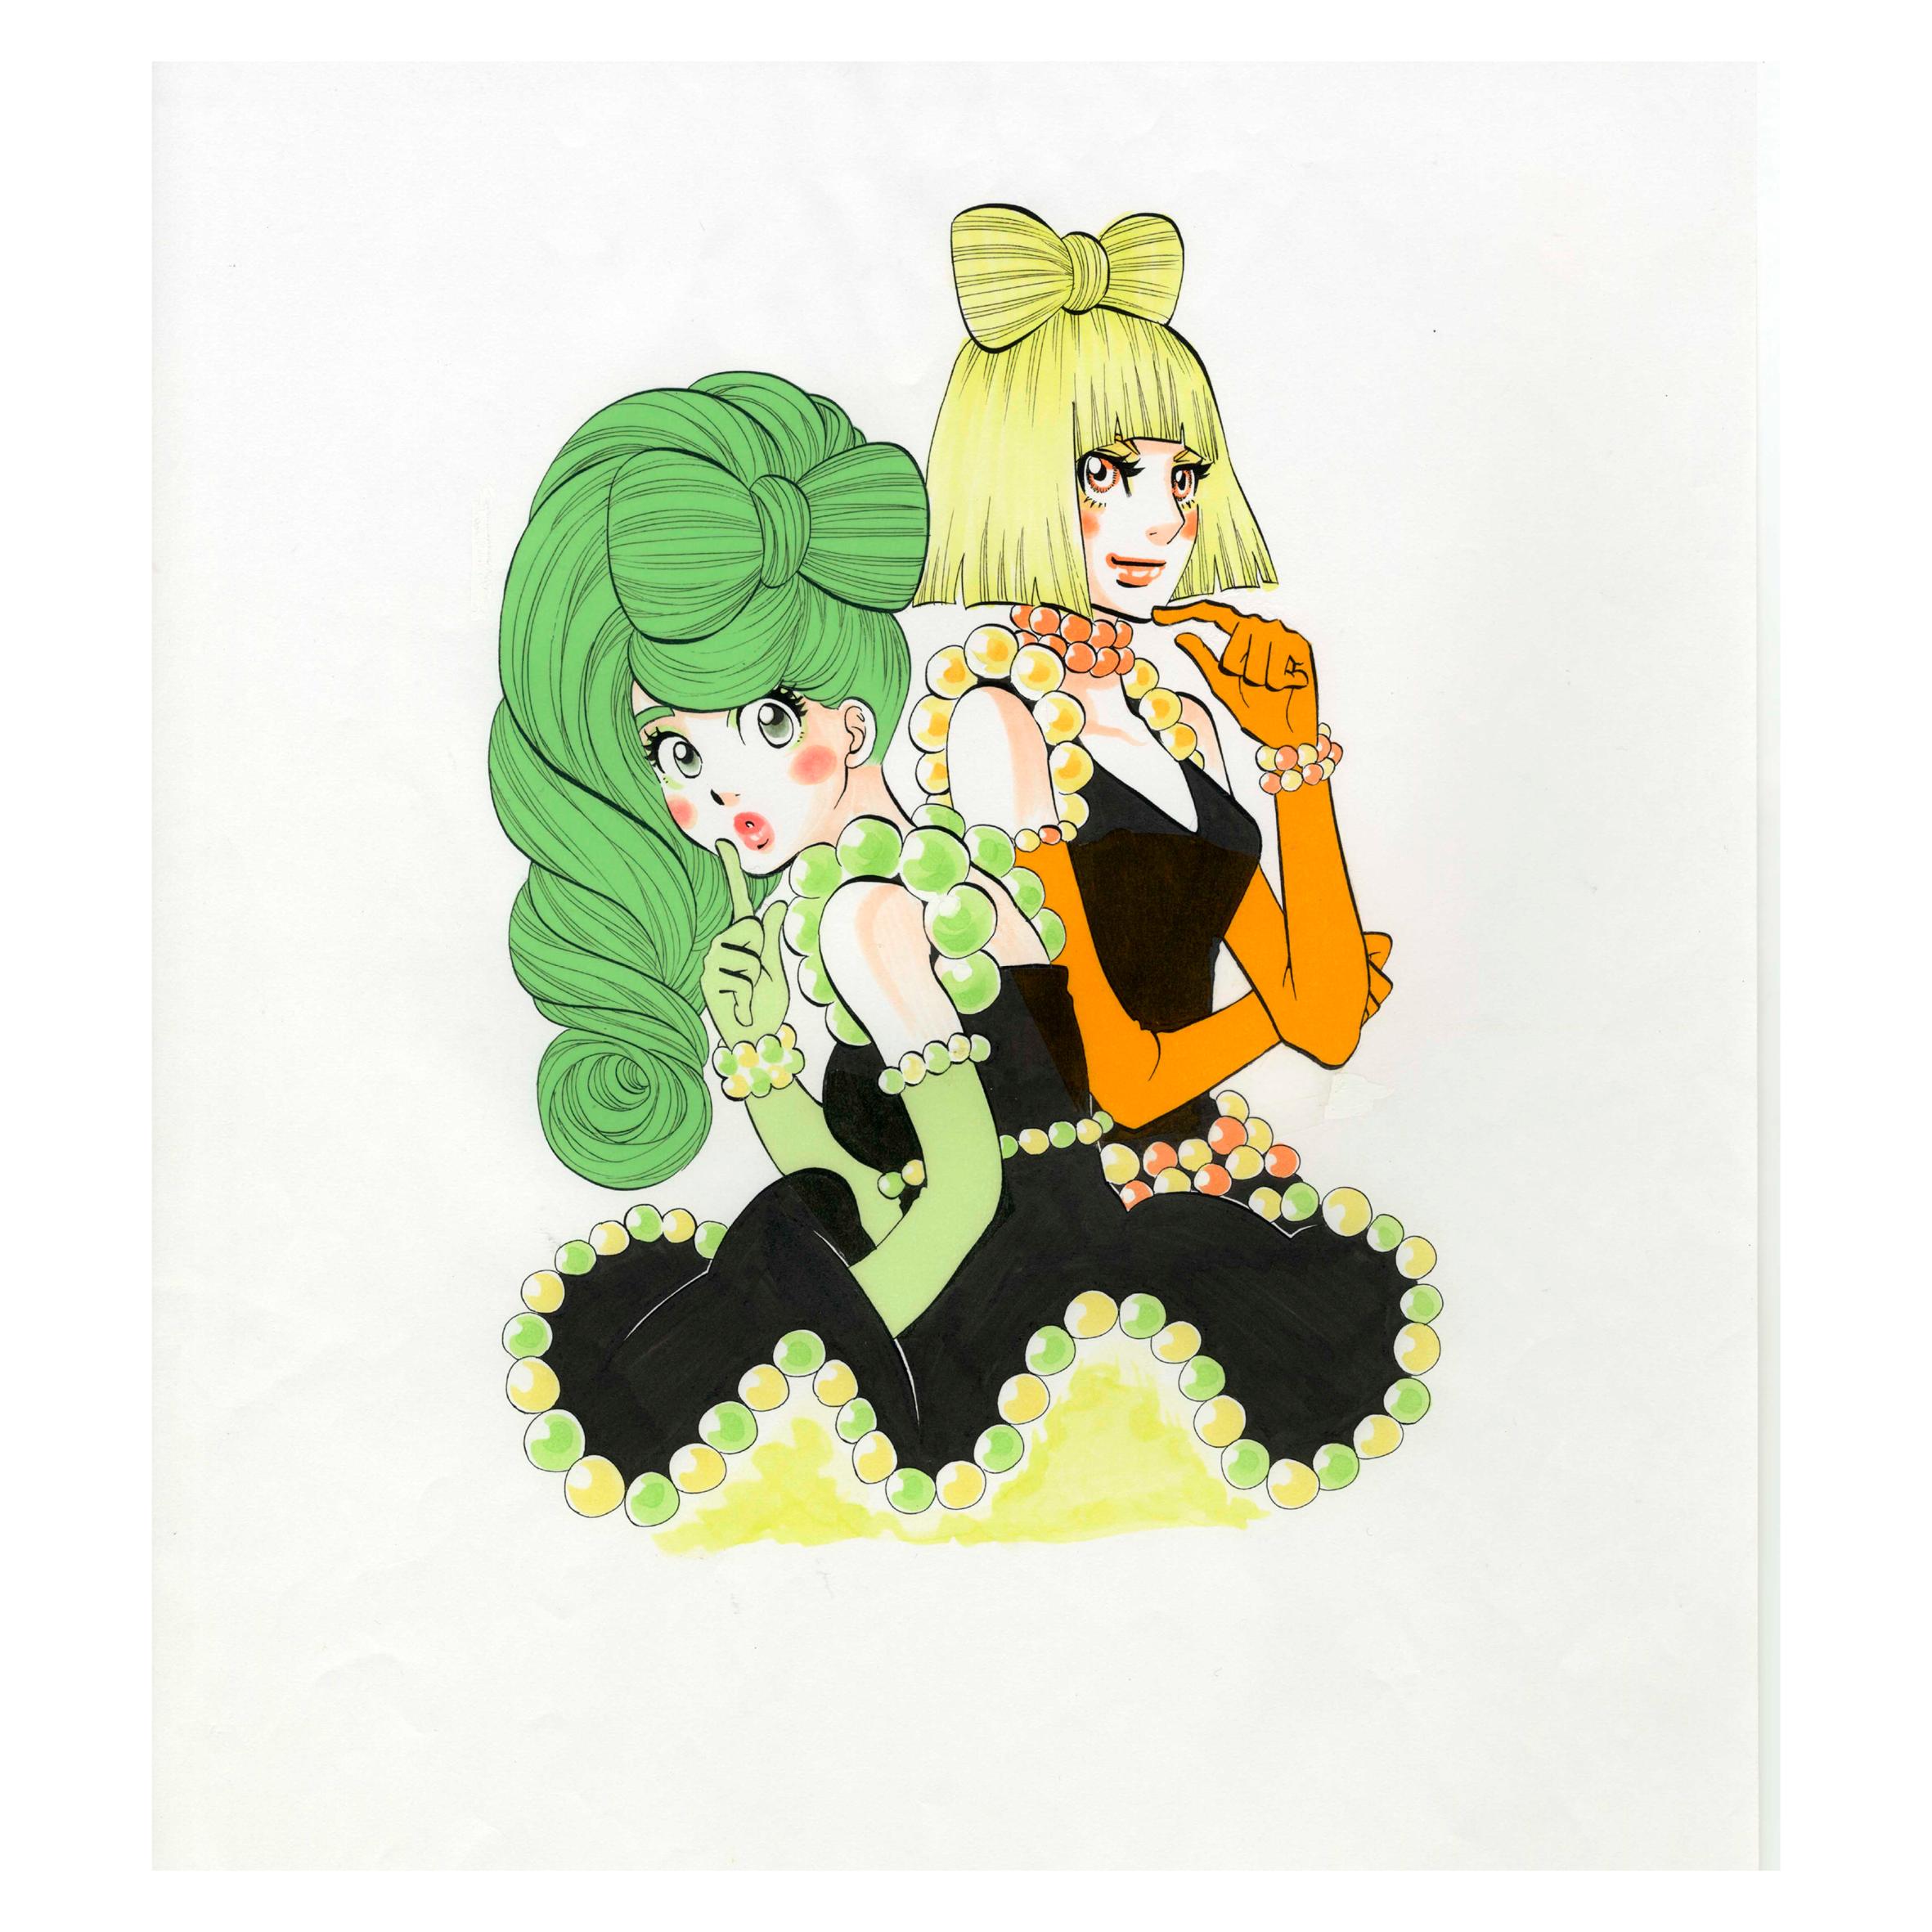 Higashimura Akiko (b.1975), Princess Jellyfish (Kuragehime), 2008-2017 © Akiko Higashimura / Kodansha Ltd.